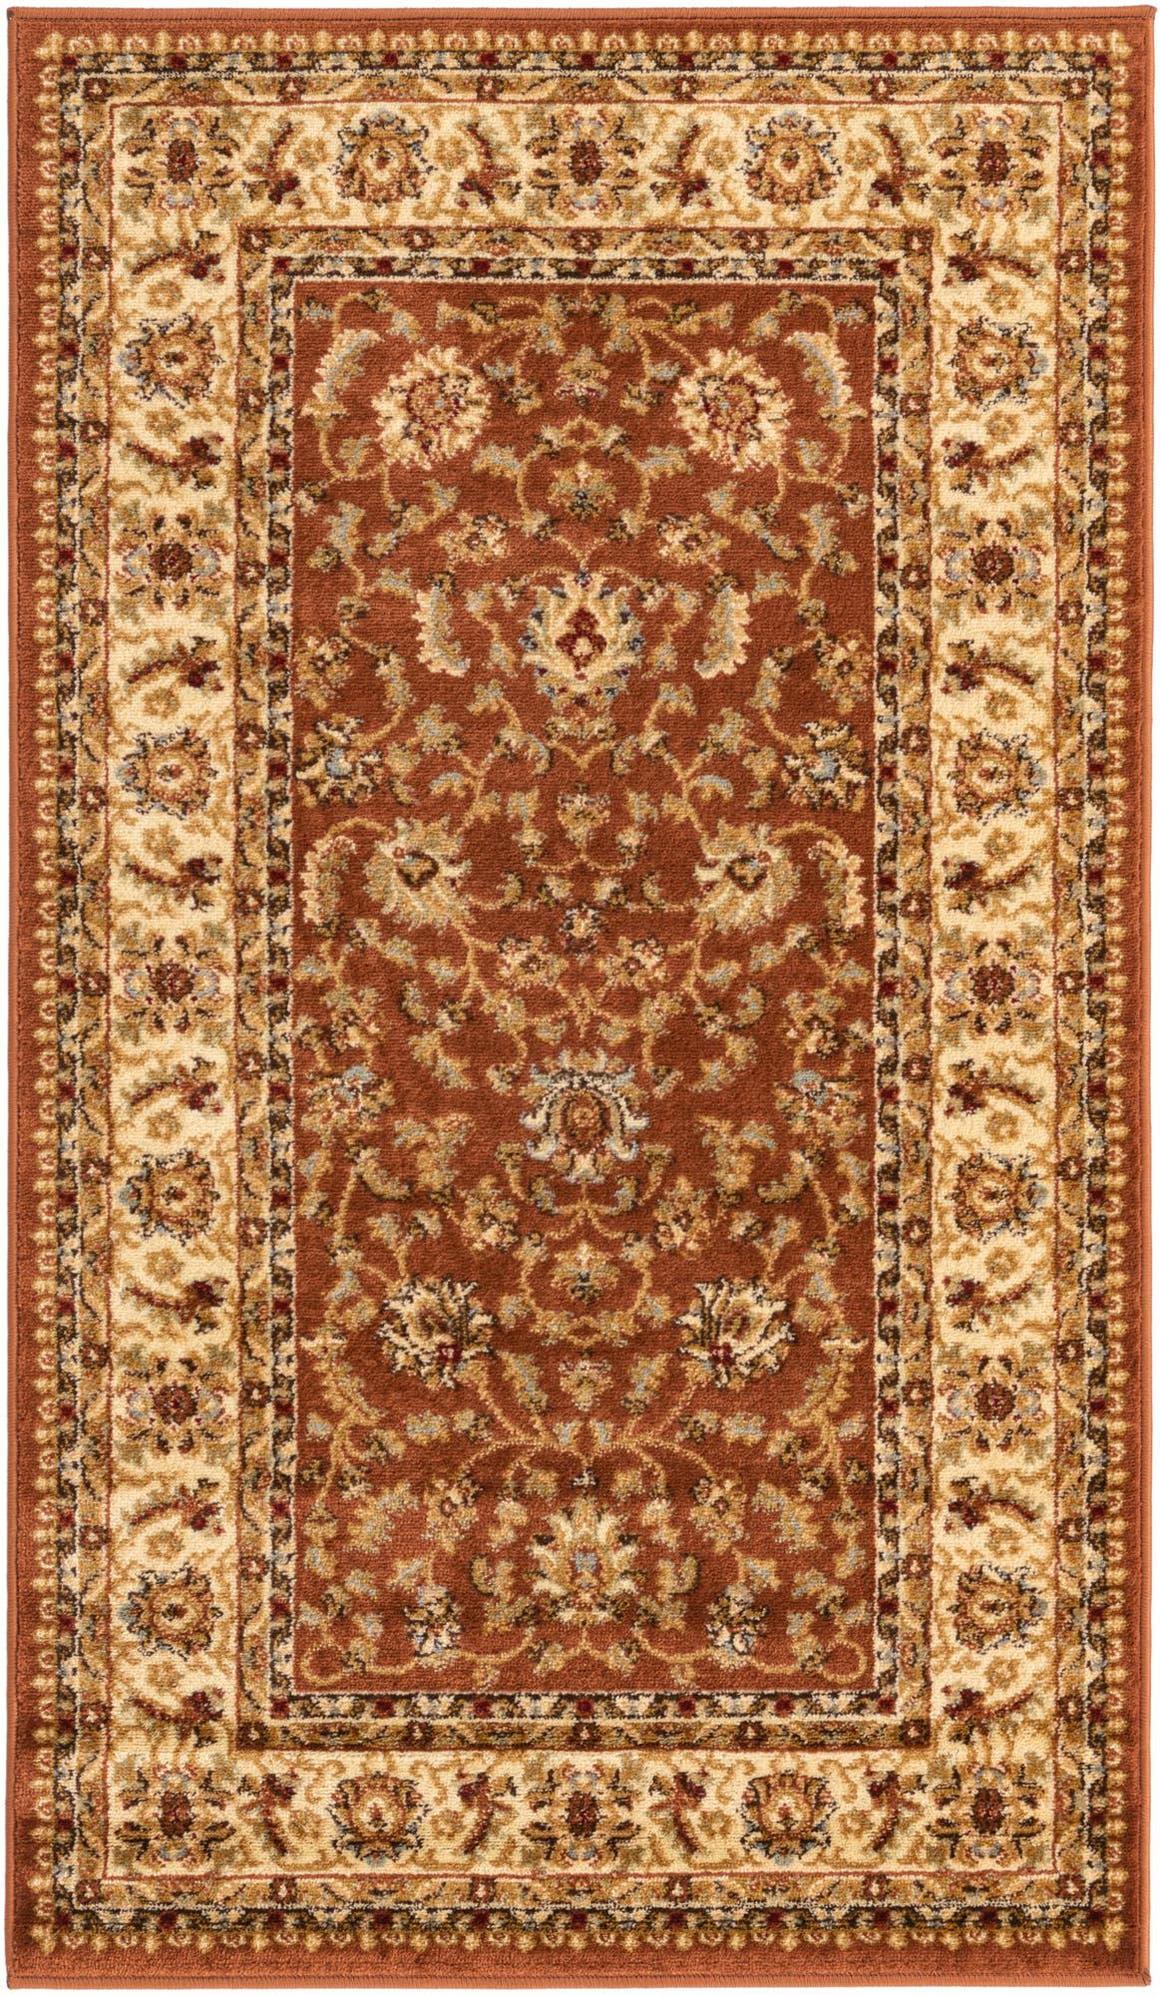 3' 3 x 5' 3 Classic Agra Rug main image